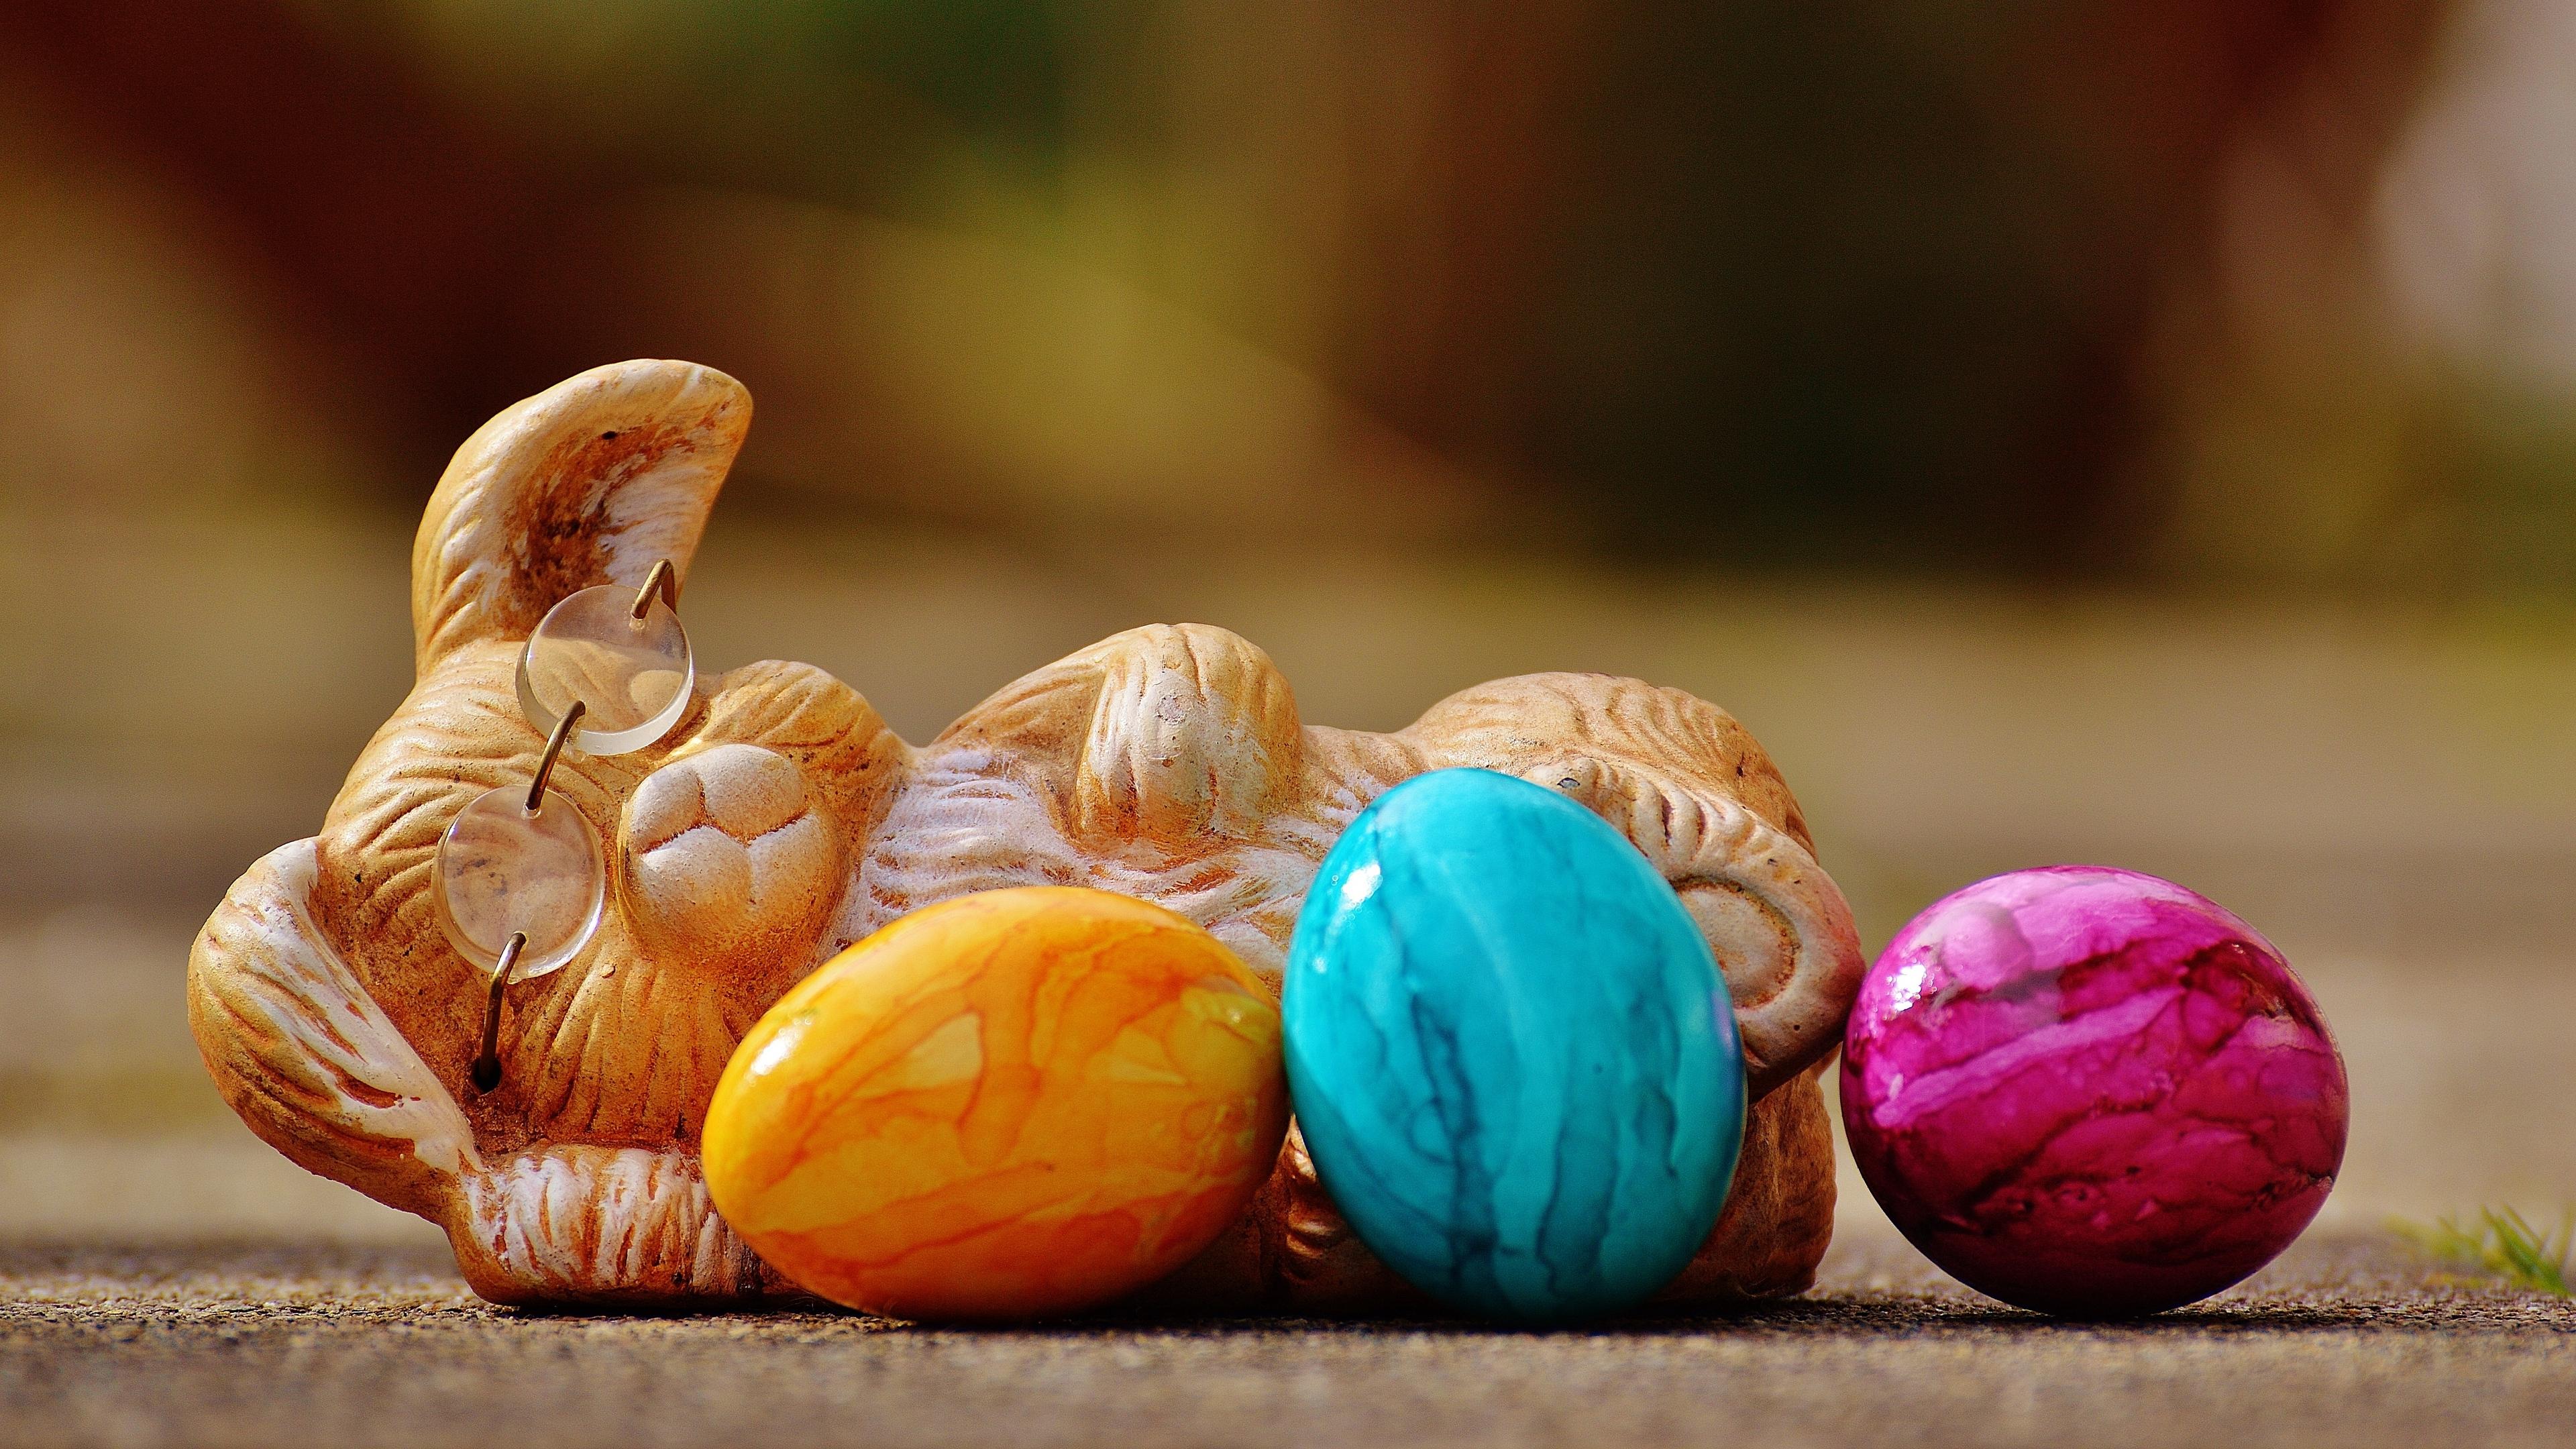 easter easter bunny eggs 4k 1538345163 - easter, easter bunny, eggs 4k - Eggs, easter bunny, Easter